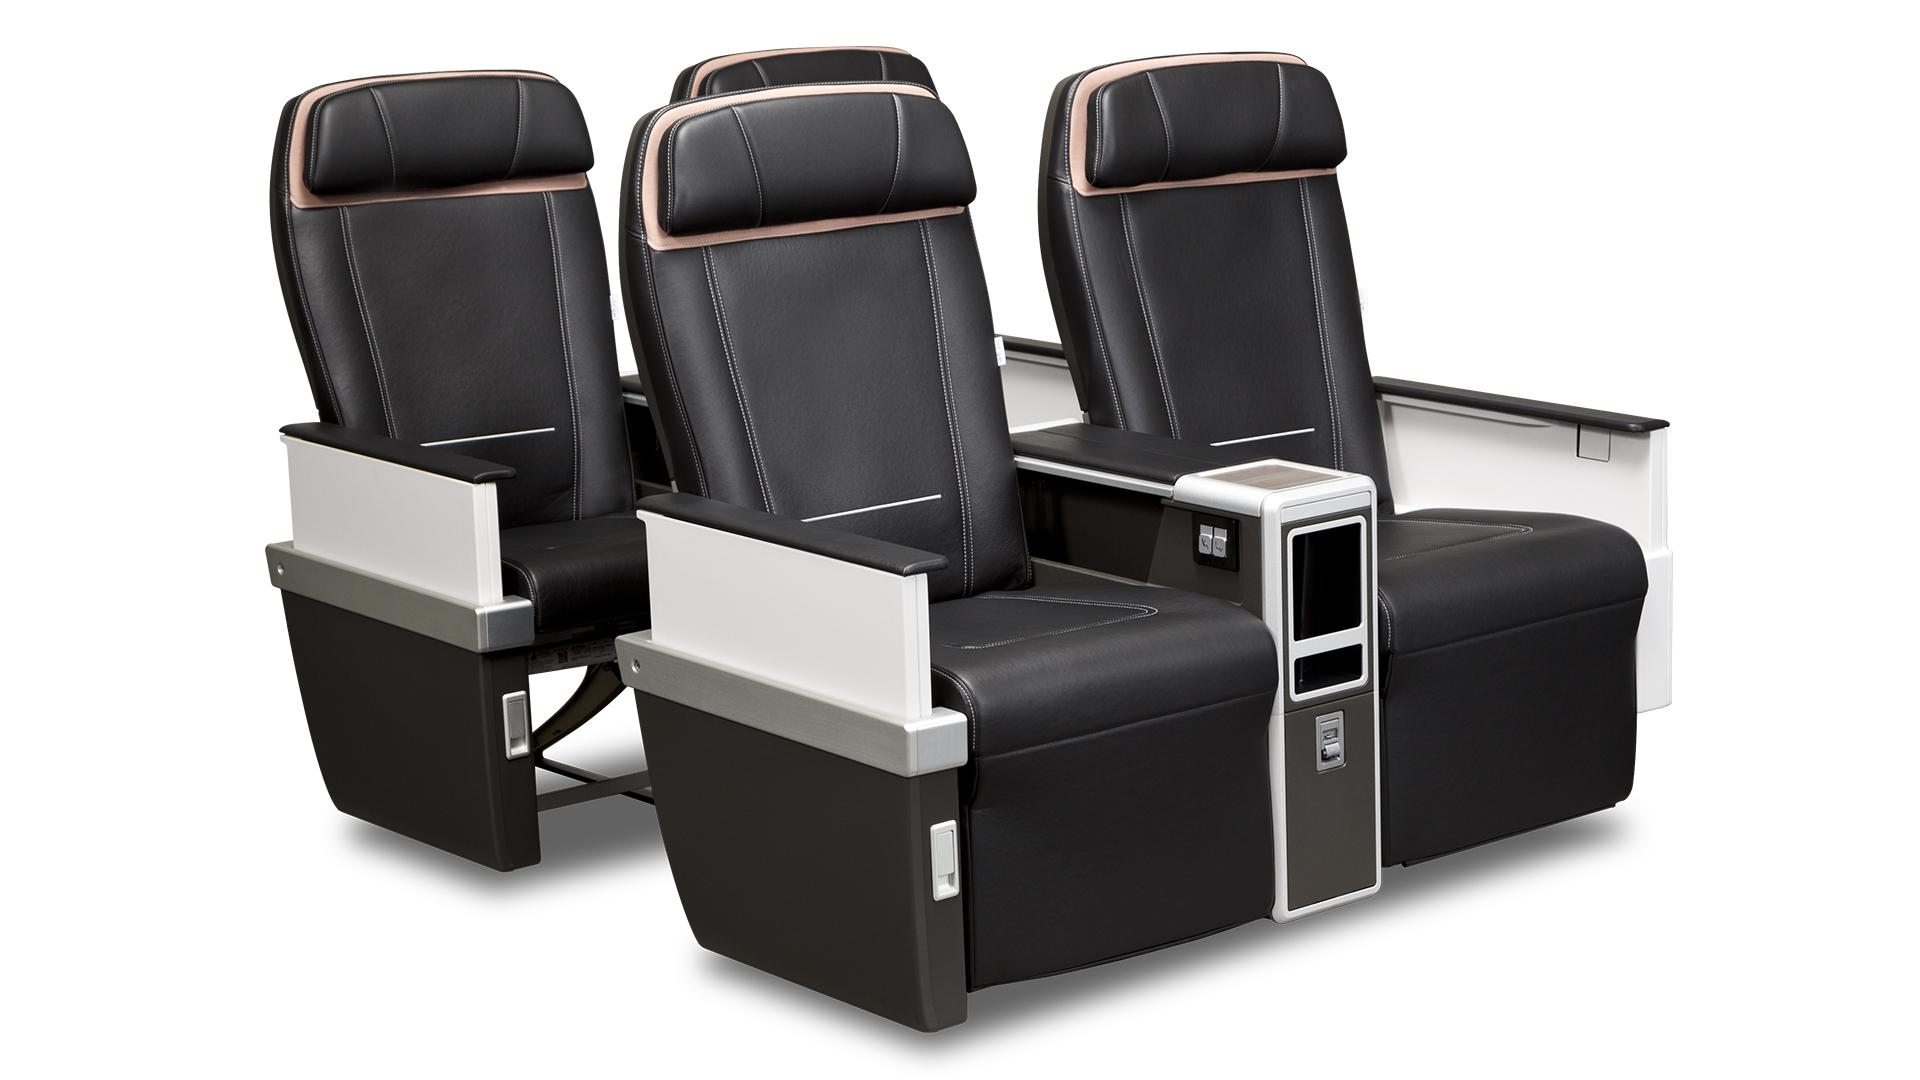 american marketing chair covers hawaii ergonomic uk ikea miq business class and premium economy seating